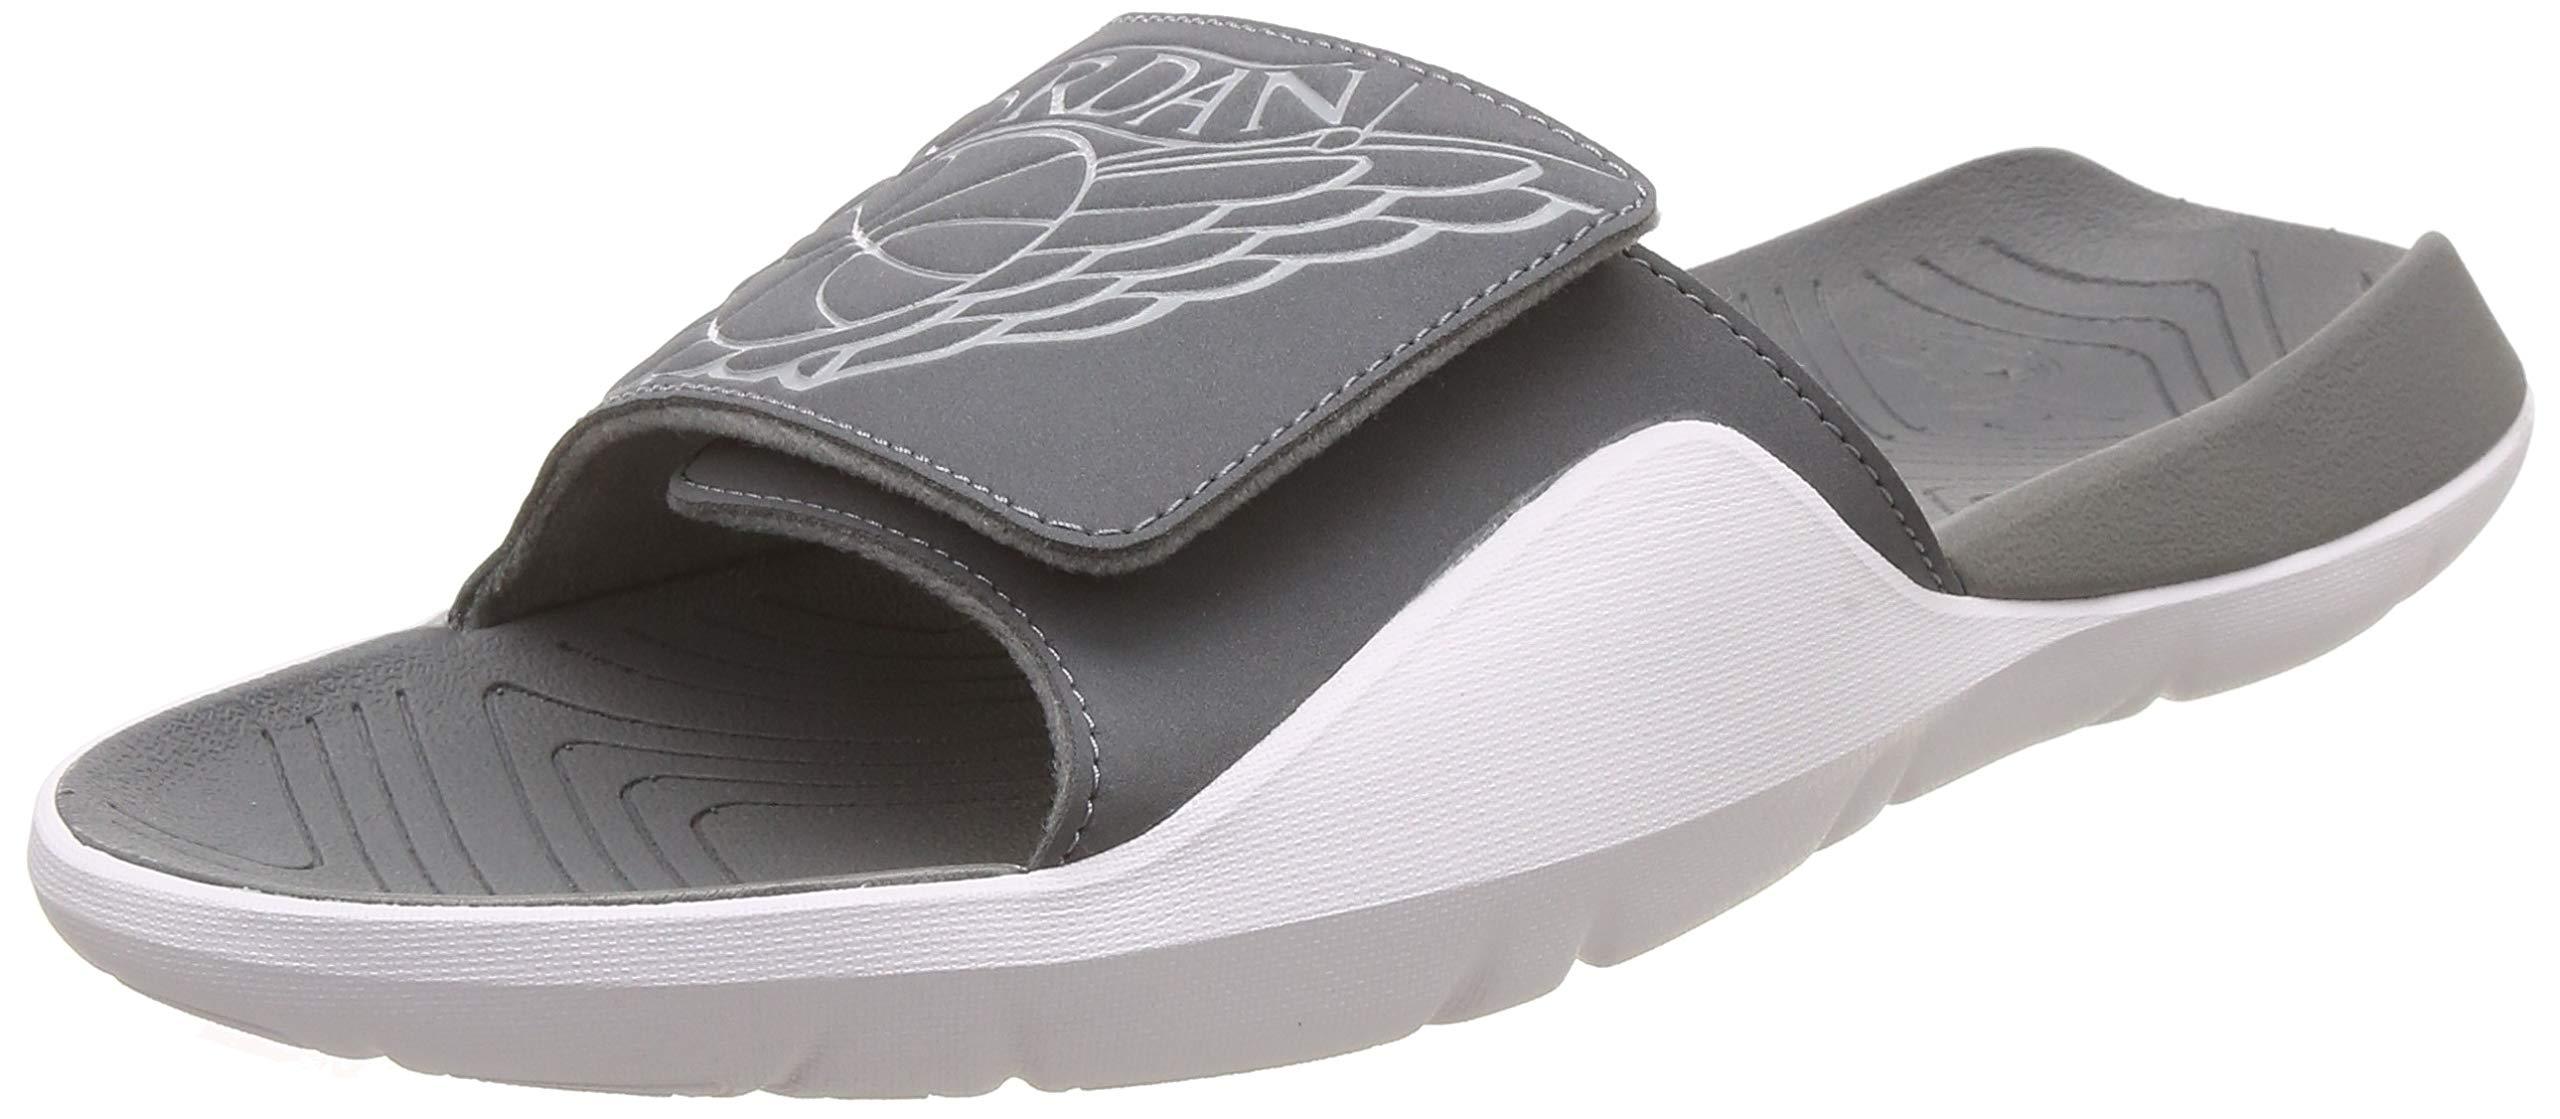 buy popular d992e c85d9 Jordan Hydro 7 Mens Slides Smoke Grey/Particle Grey/White aa2517-002 (10 M  US)